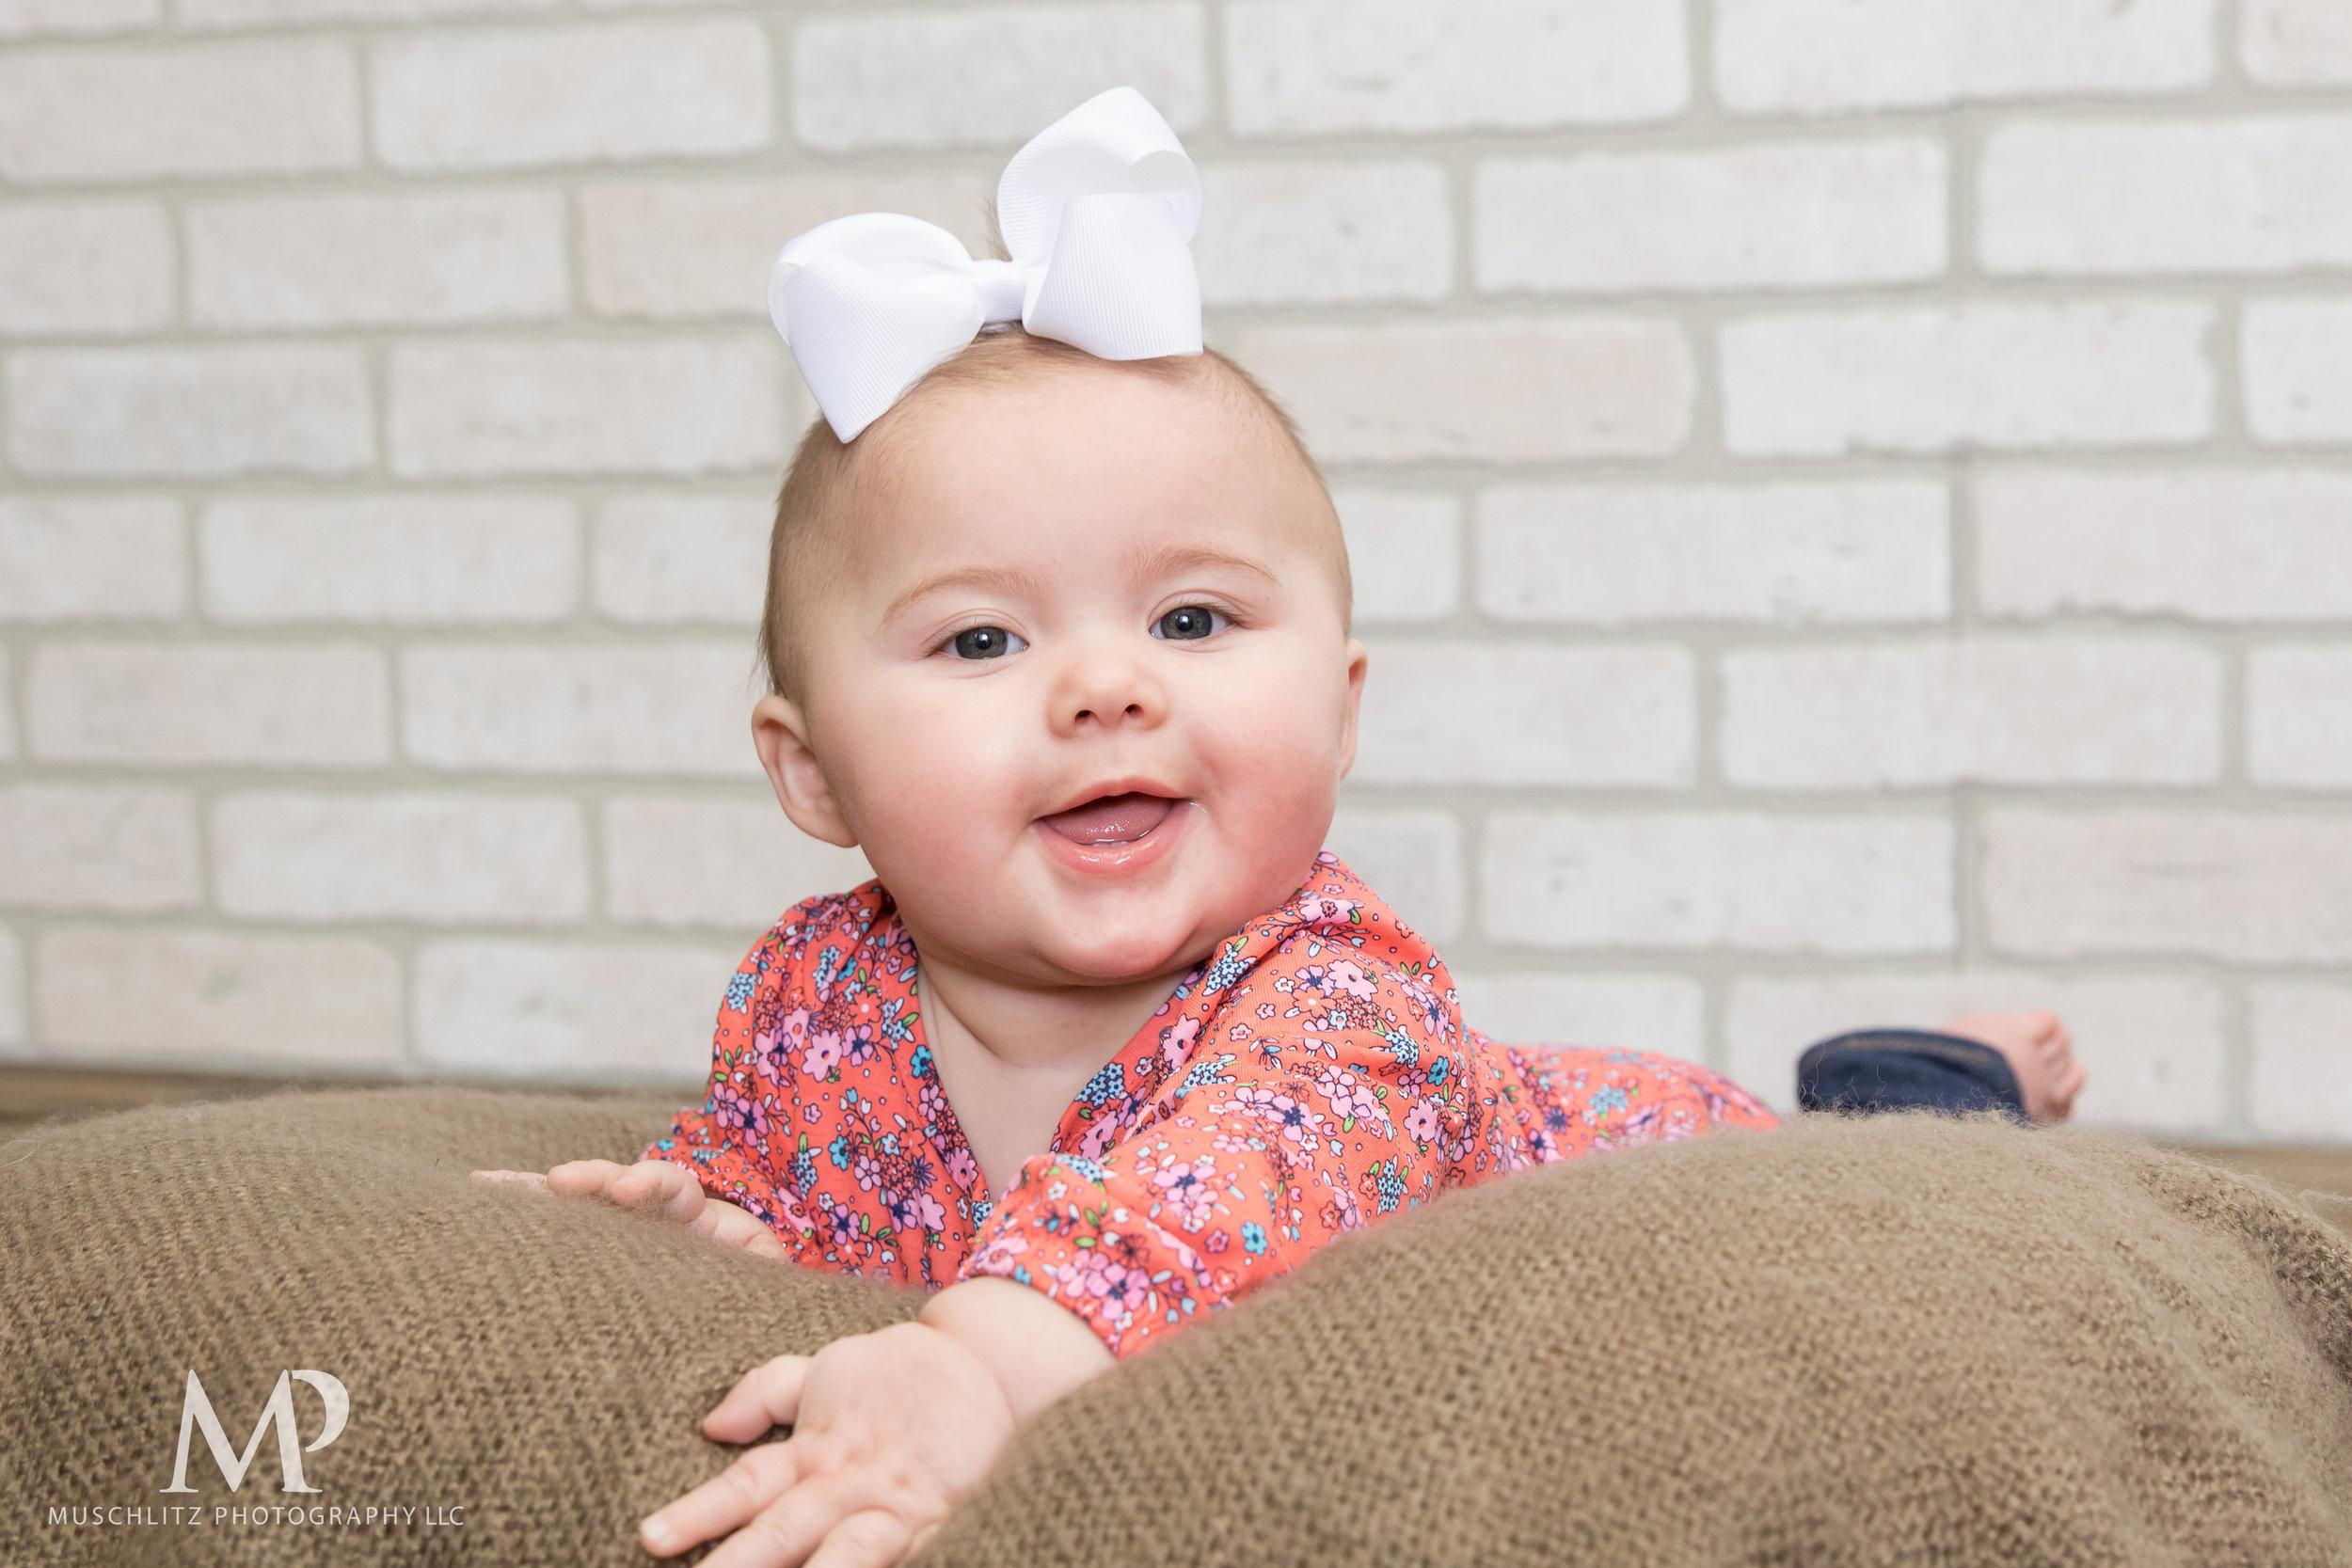 6-month-portraits-baby-photographer-columbus-ohio-gahanna-muschlitz-photography-005.JPG